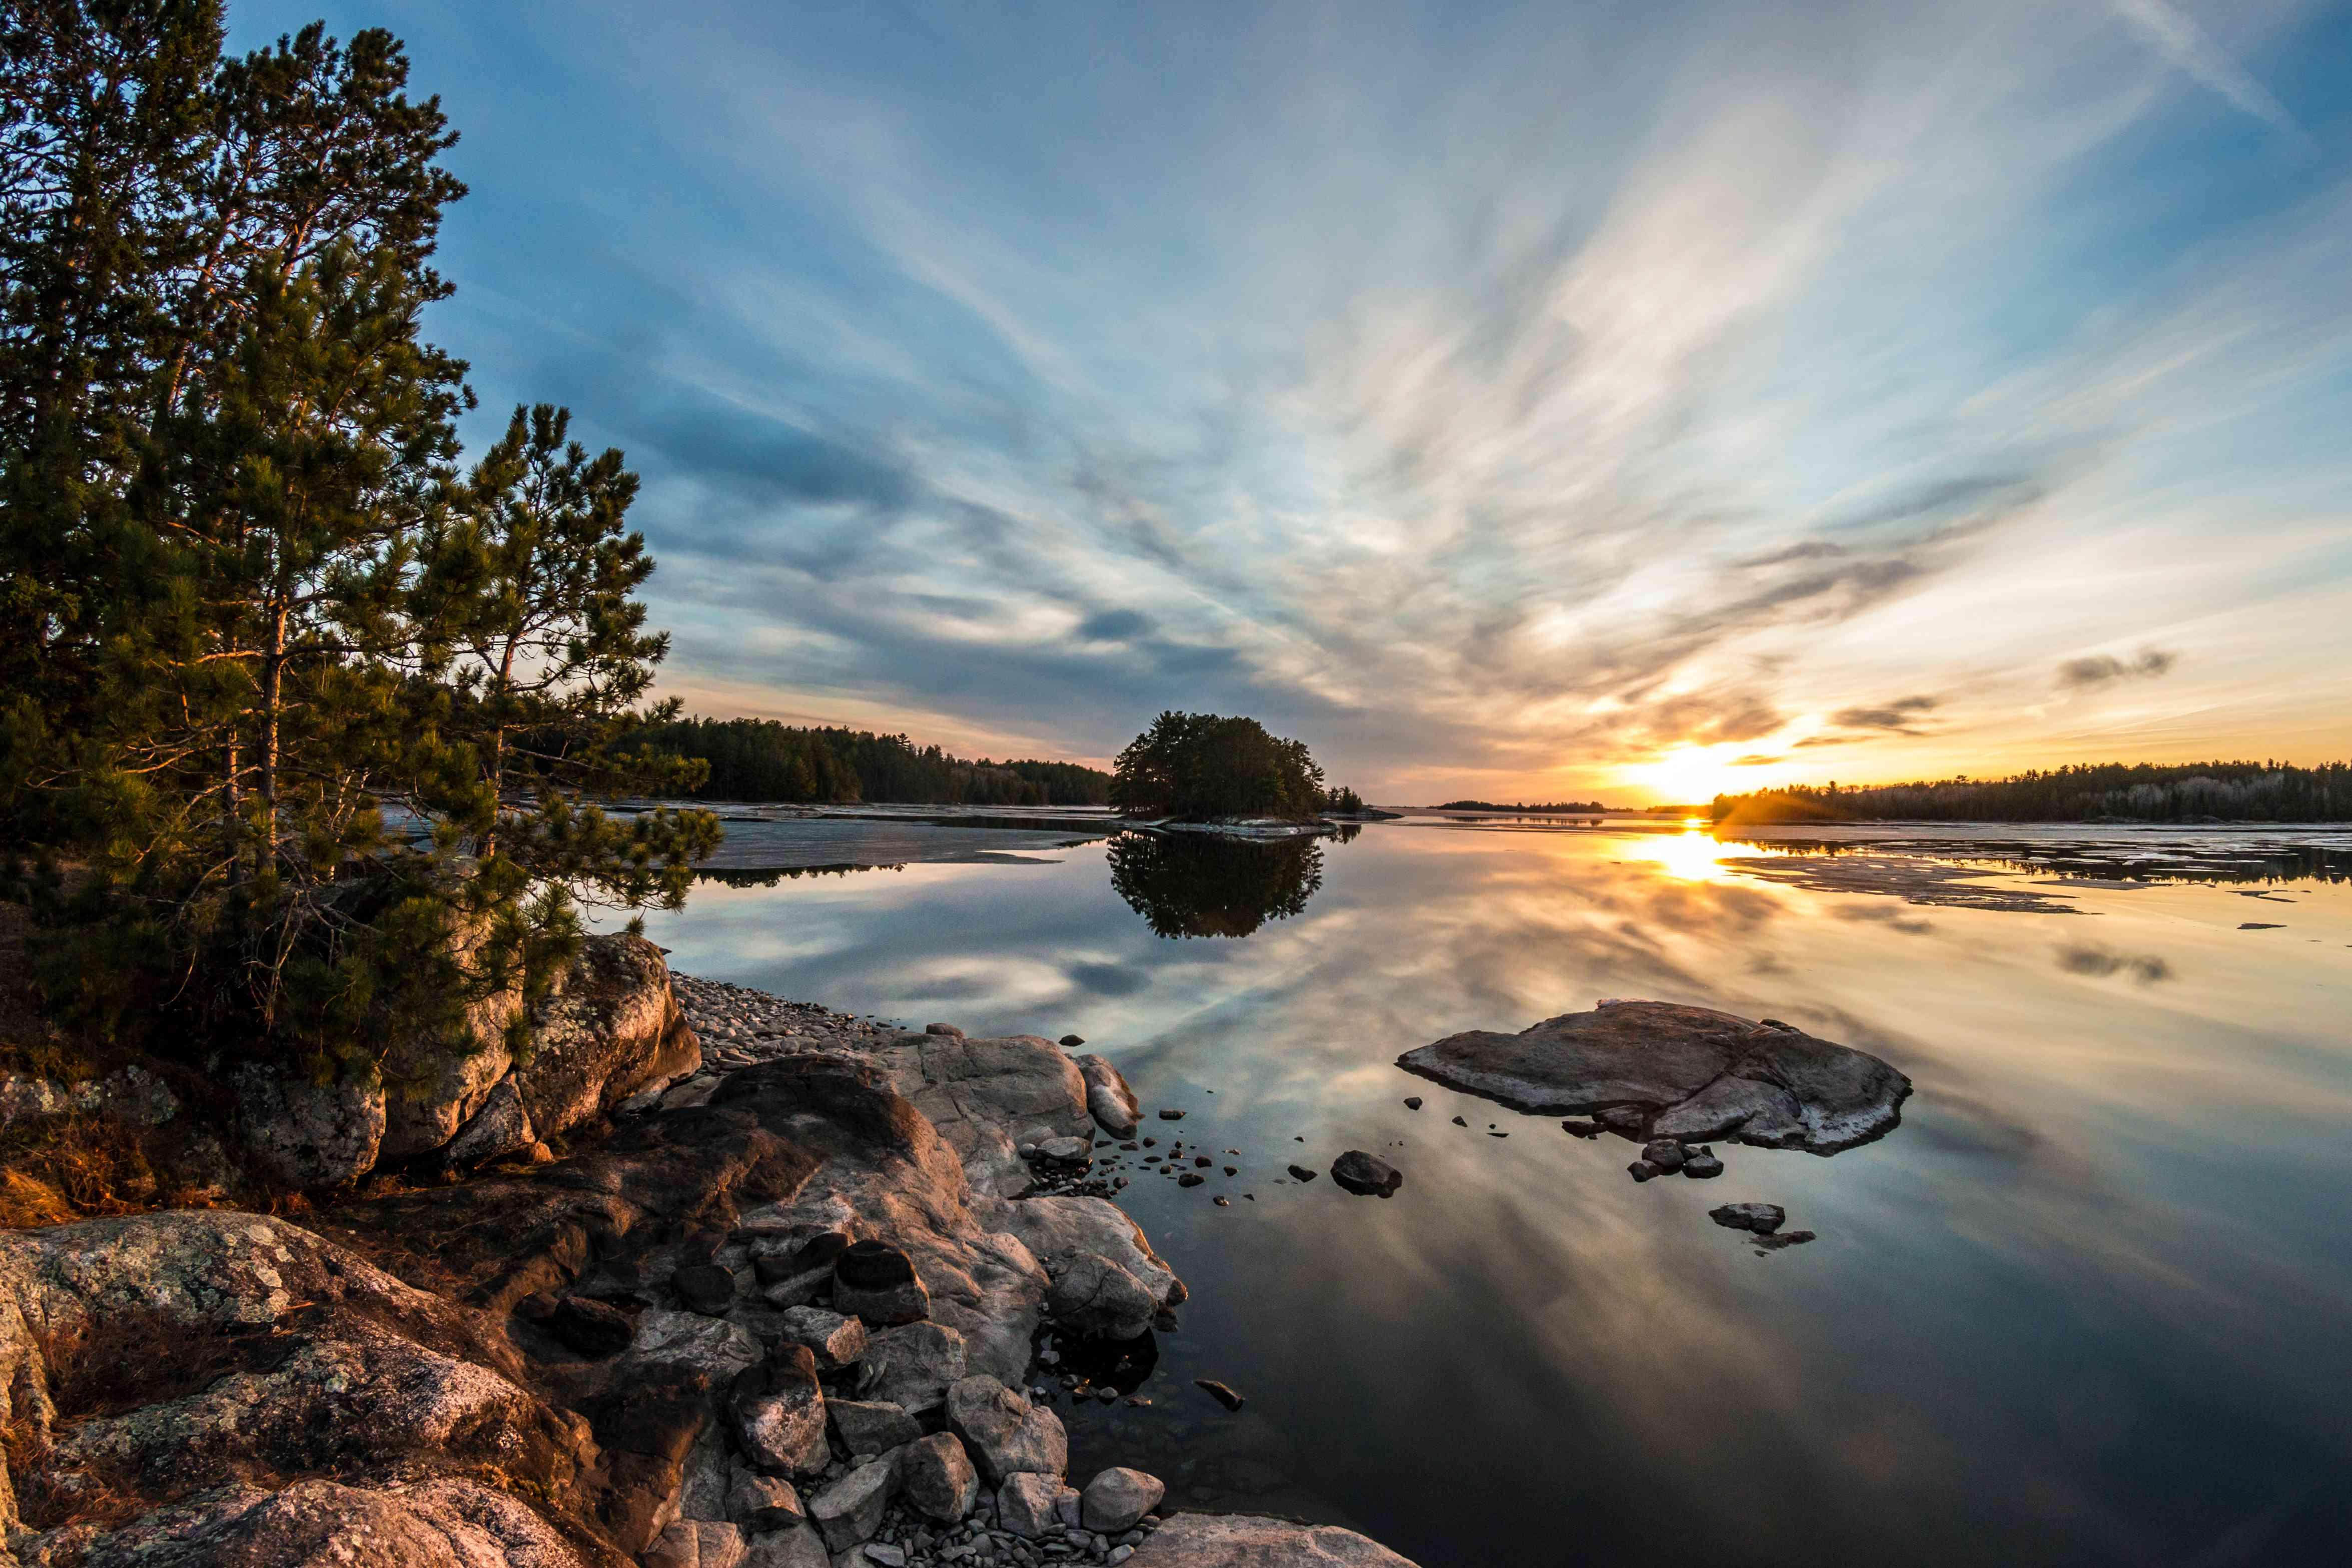 View of sunset over Lake Kabetogama, Voyageurs National Park